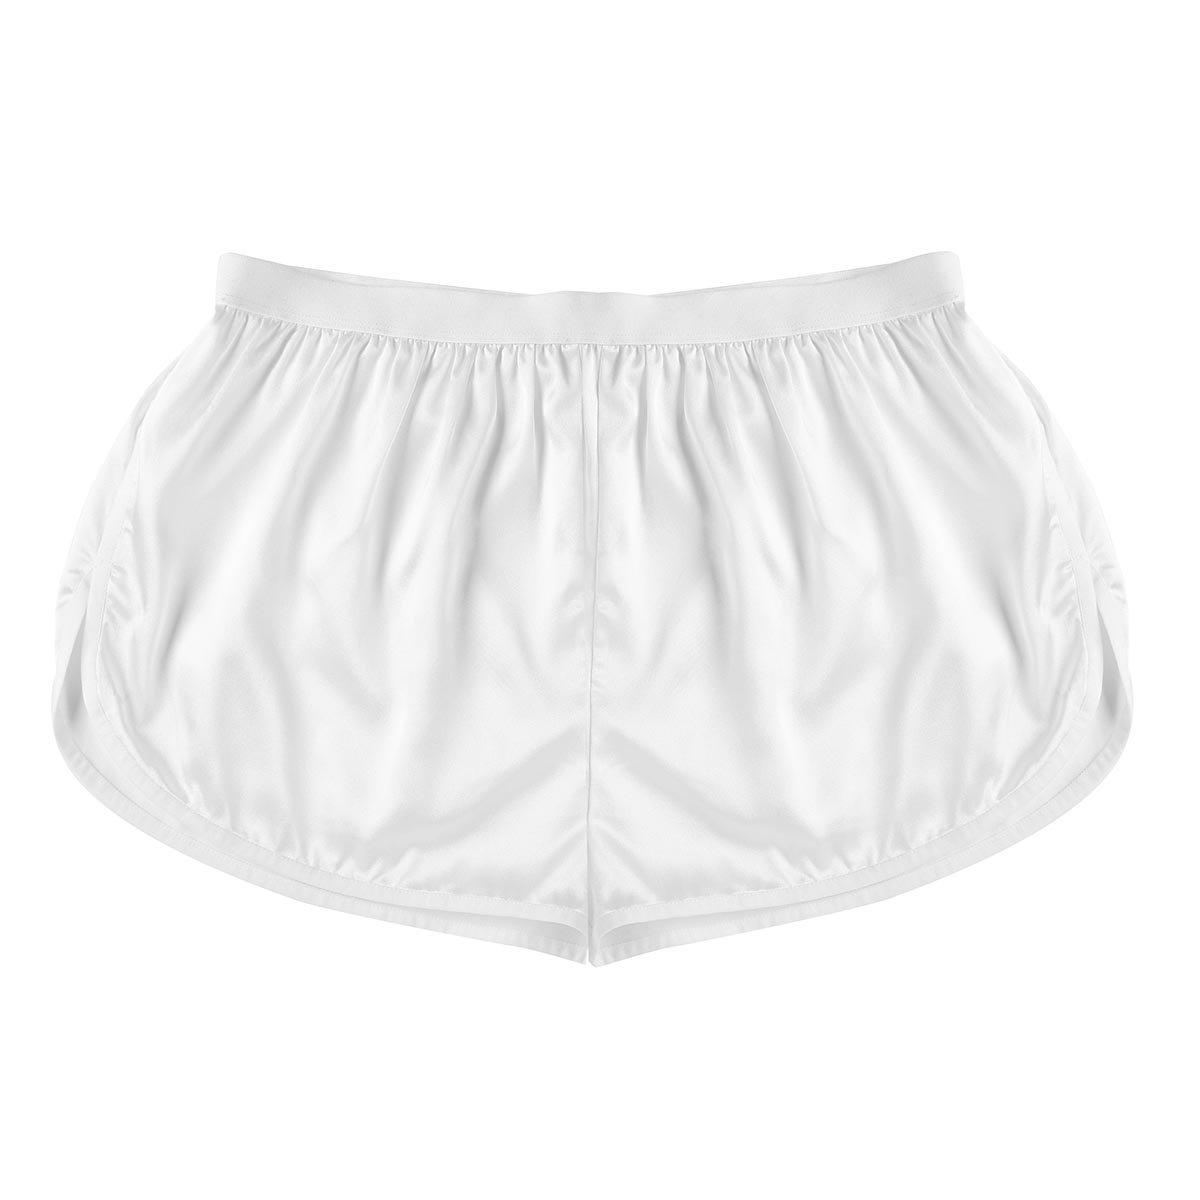 Tiaobug Herren modische Shorts Badeshorts Badehose Kurze Hose Sport Hose Pants Schwimmshorts Beachwear Strand Shorts Boxer Brief M-XL